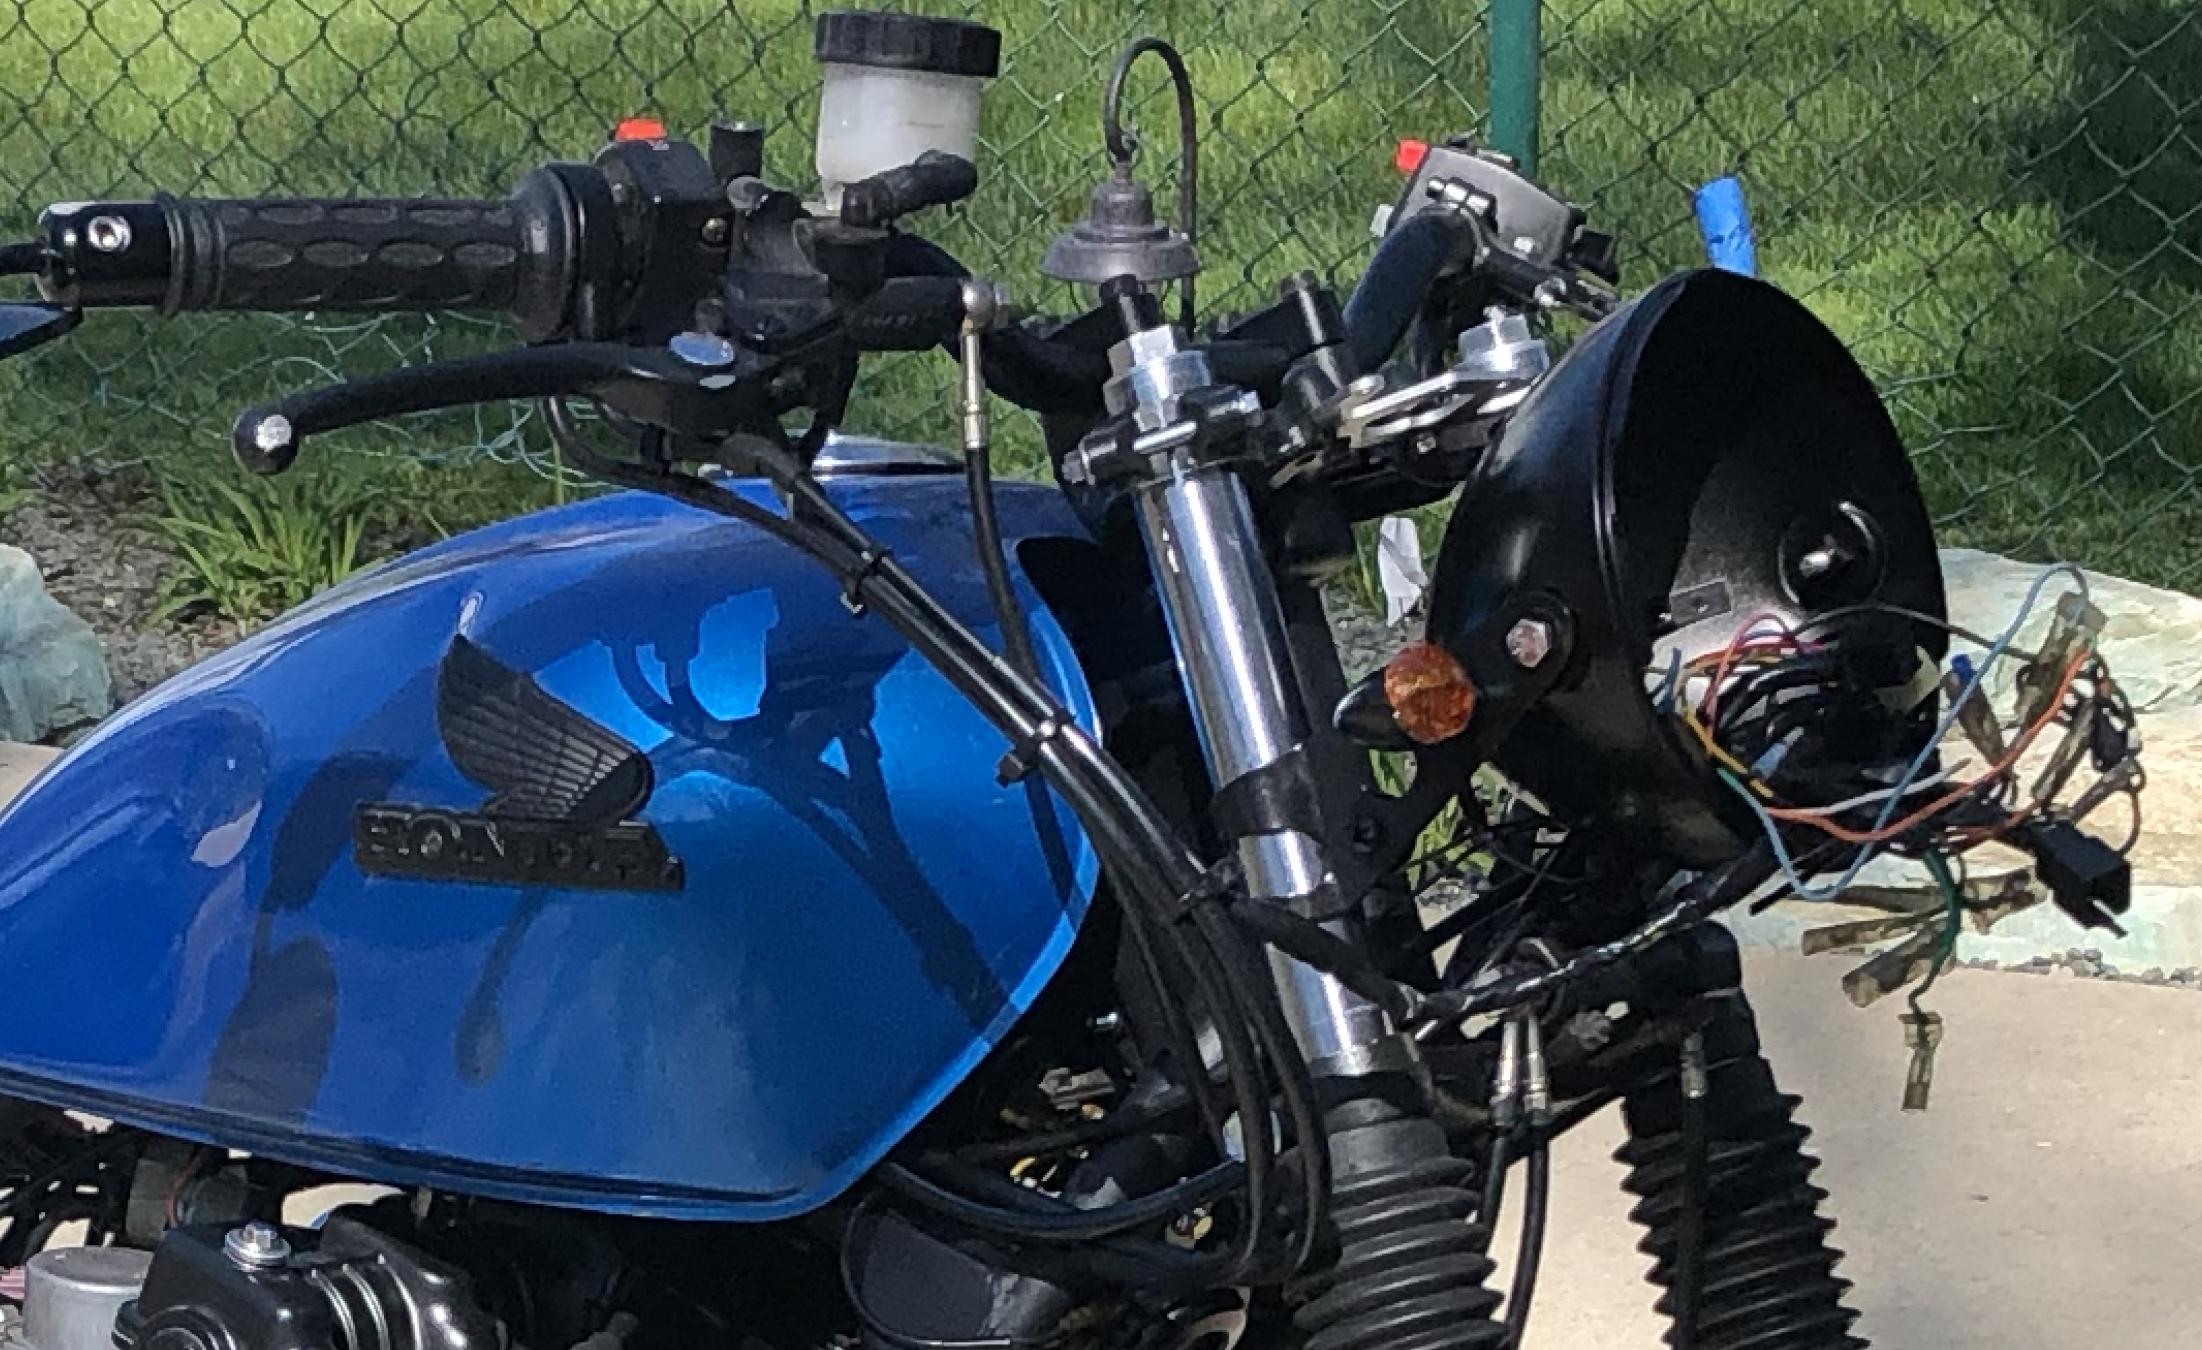 [DIAGRAM_3NM]  Honda CB750 Wiring Weekend - Nix Garage | Honda Cb750 Wiring |  | Nix Garage